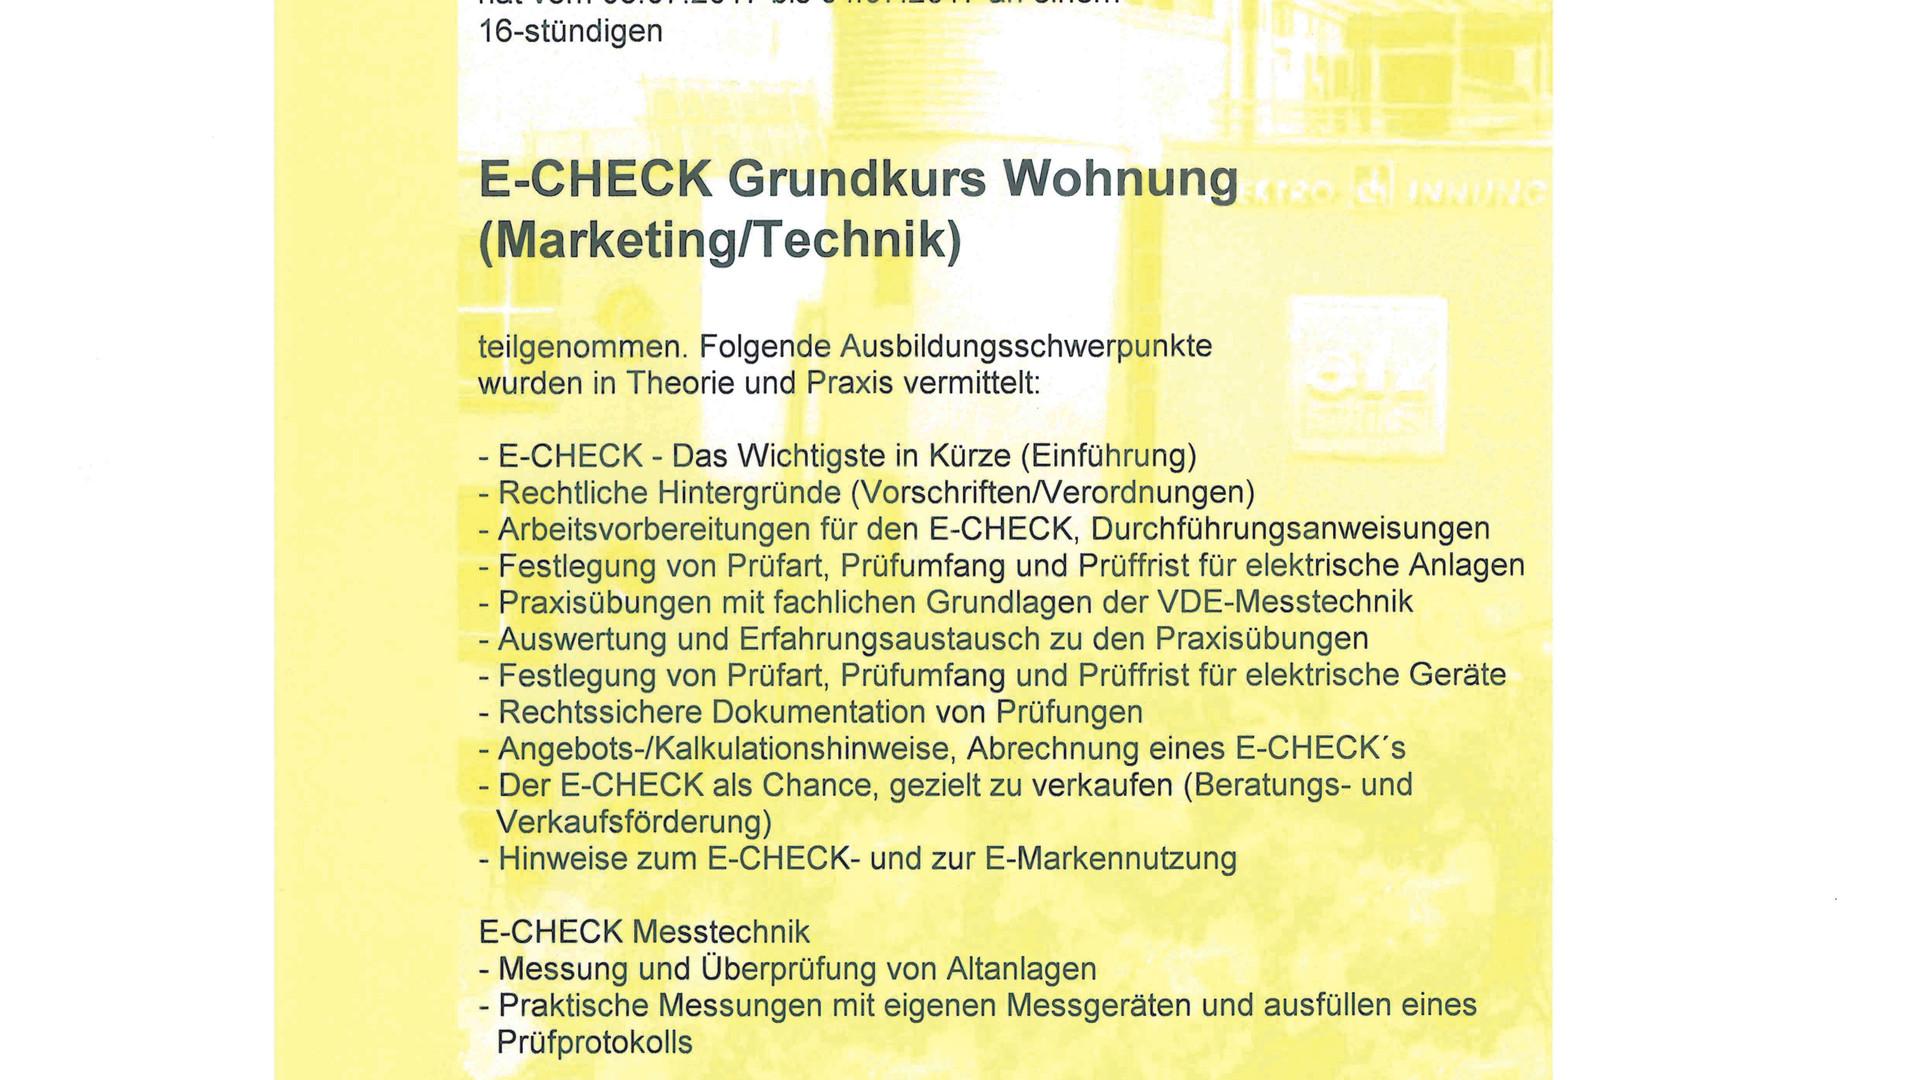 E-Check Grundkurs Wohnung.jpg